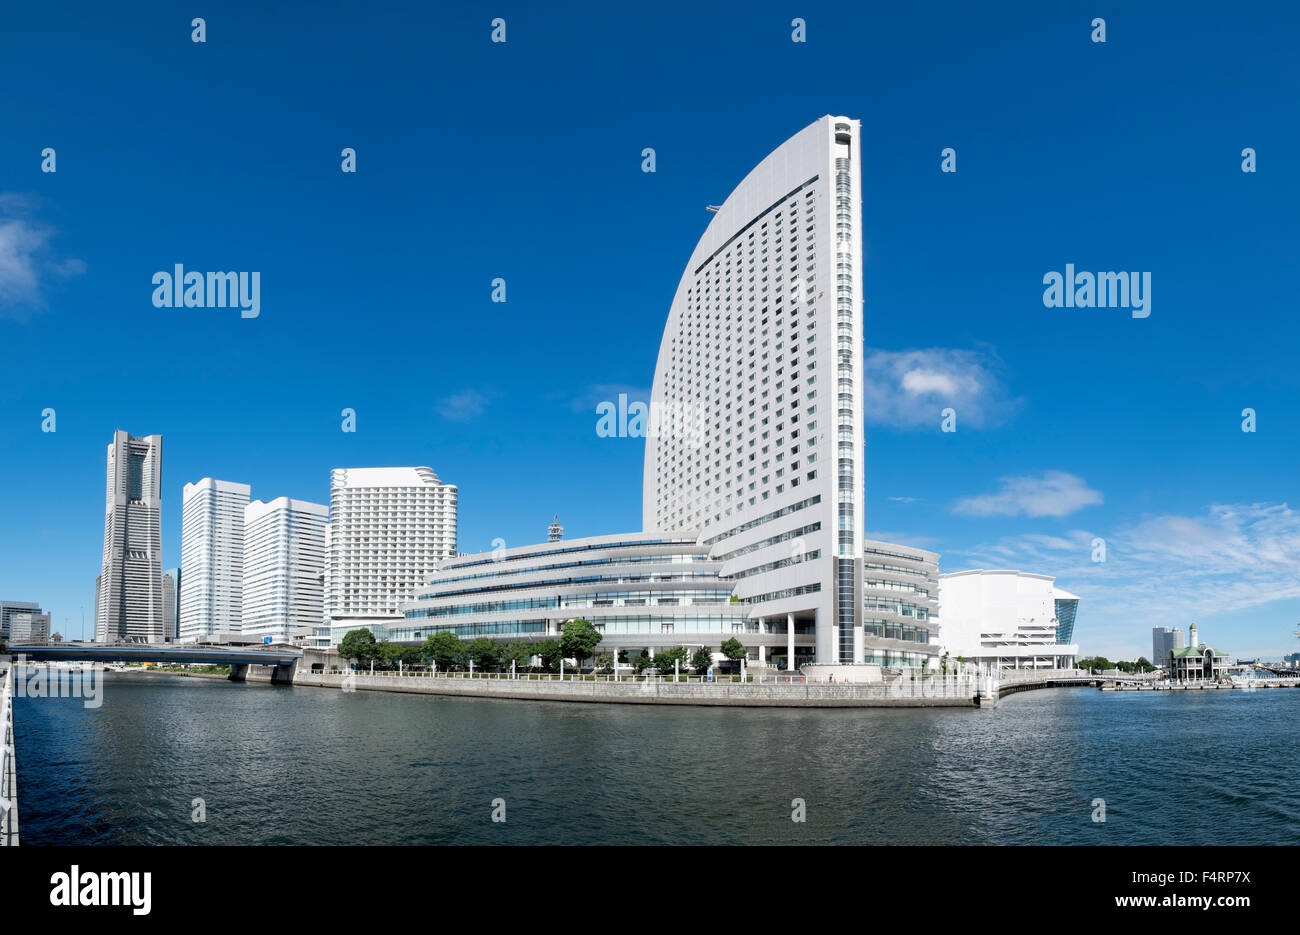 View of Intercontinental Hotel and skyline of Minato Mirai in Yokohama Japan - Stock Image